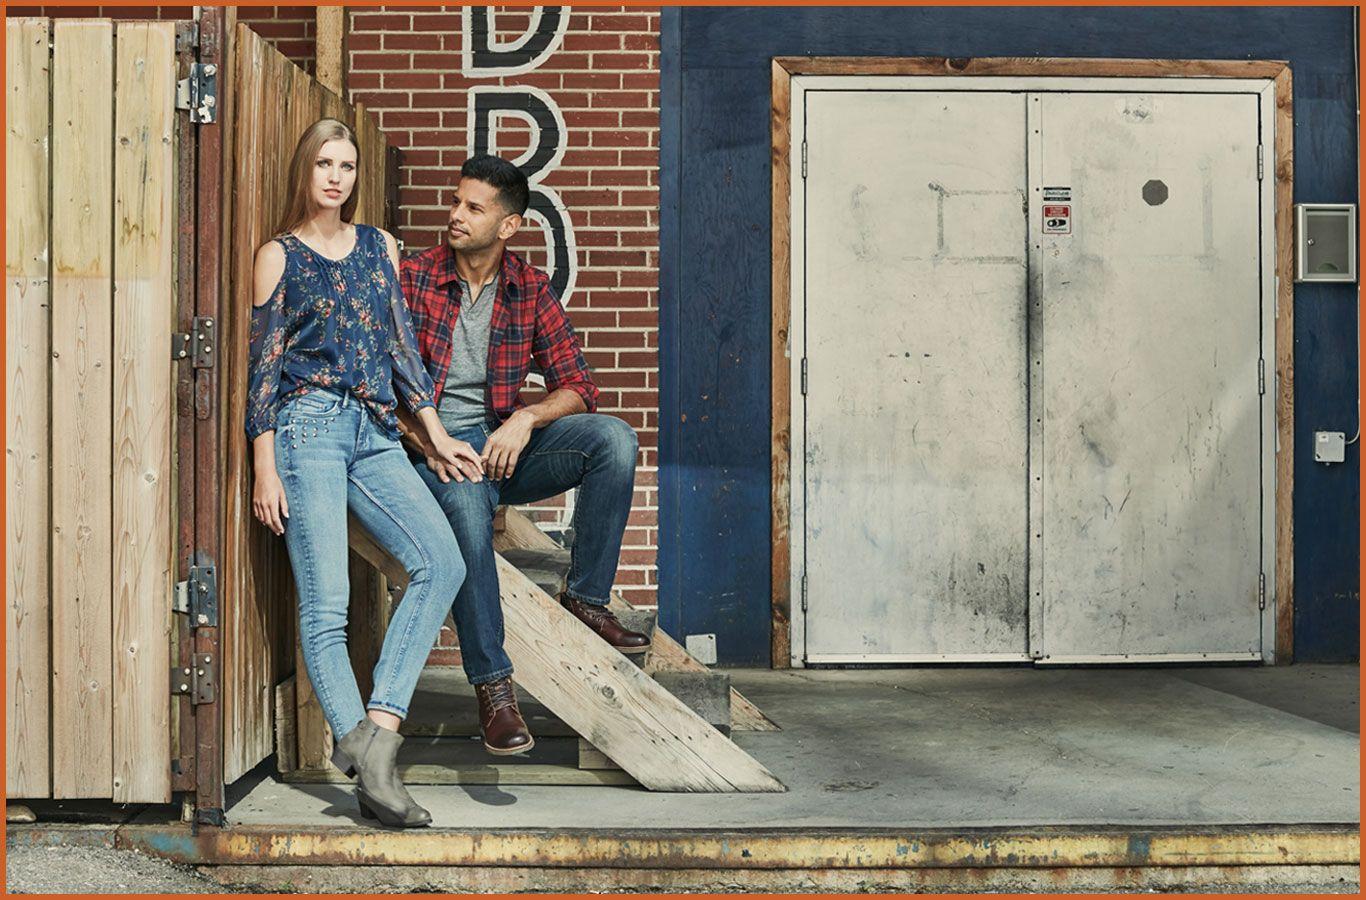 Denver Hayes Jeans - Shop Now